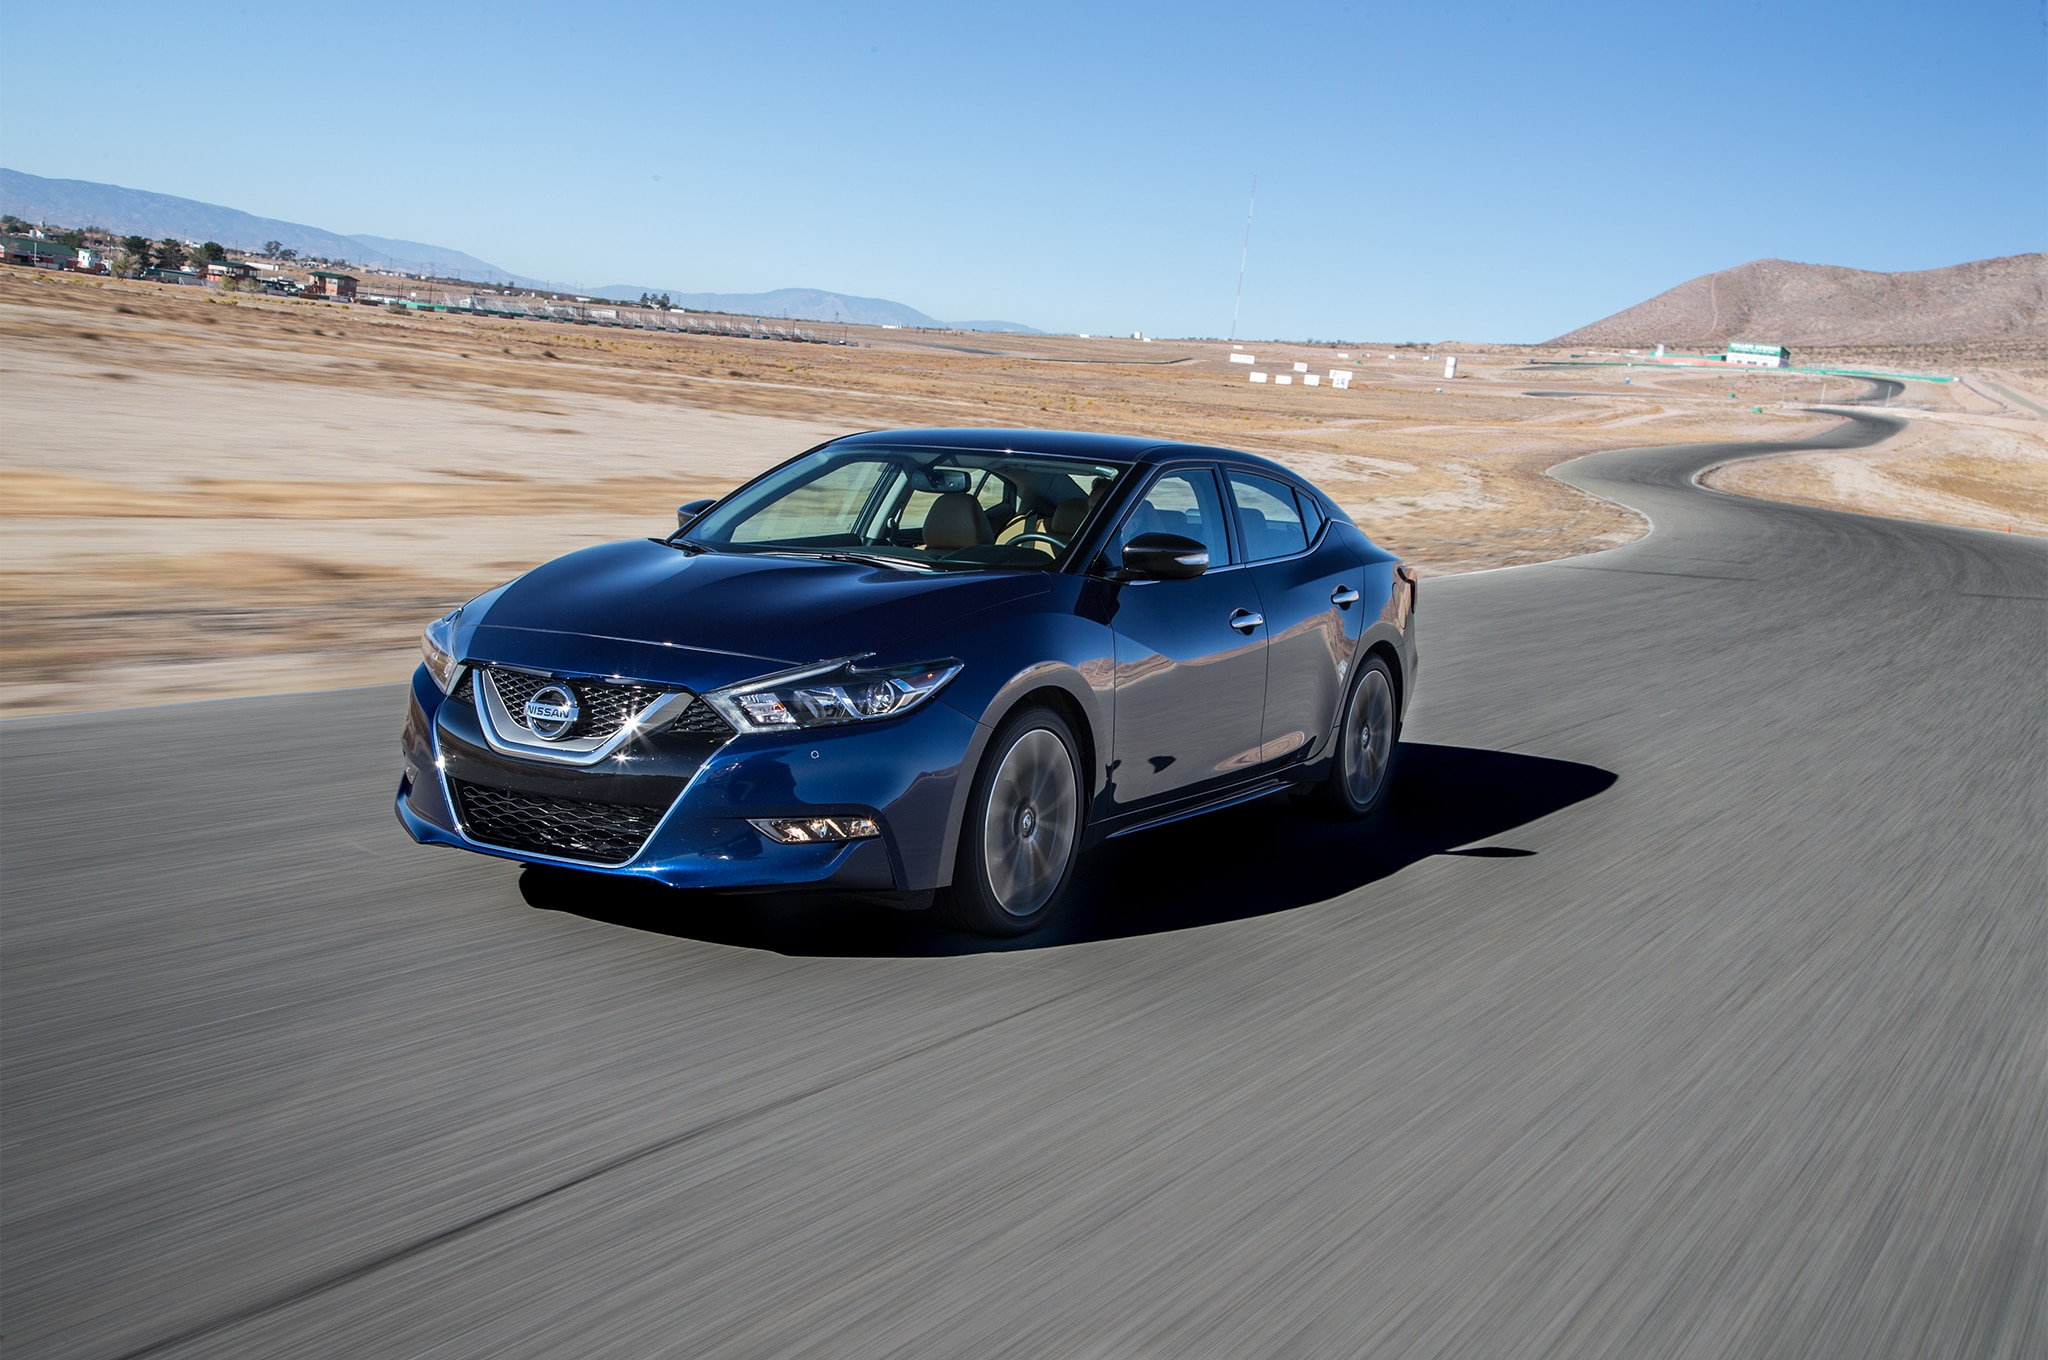 2016 Nissan Maxima SR Front Three Quarter In Motion 01